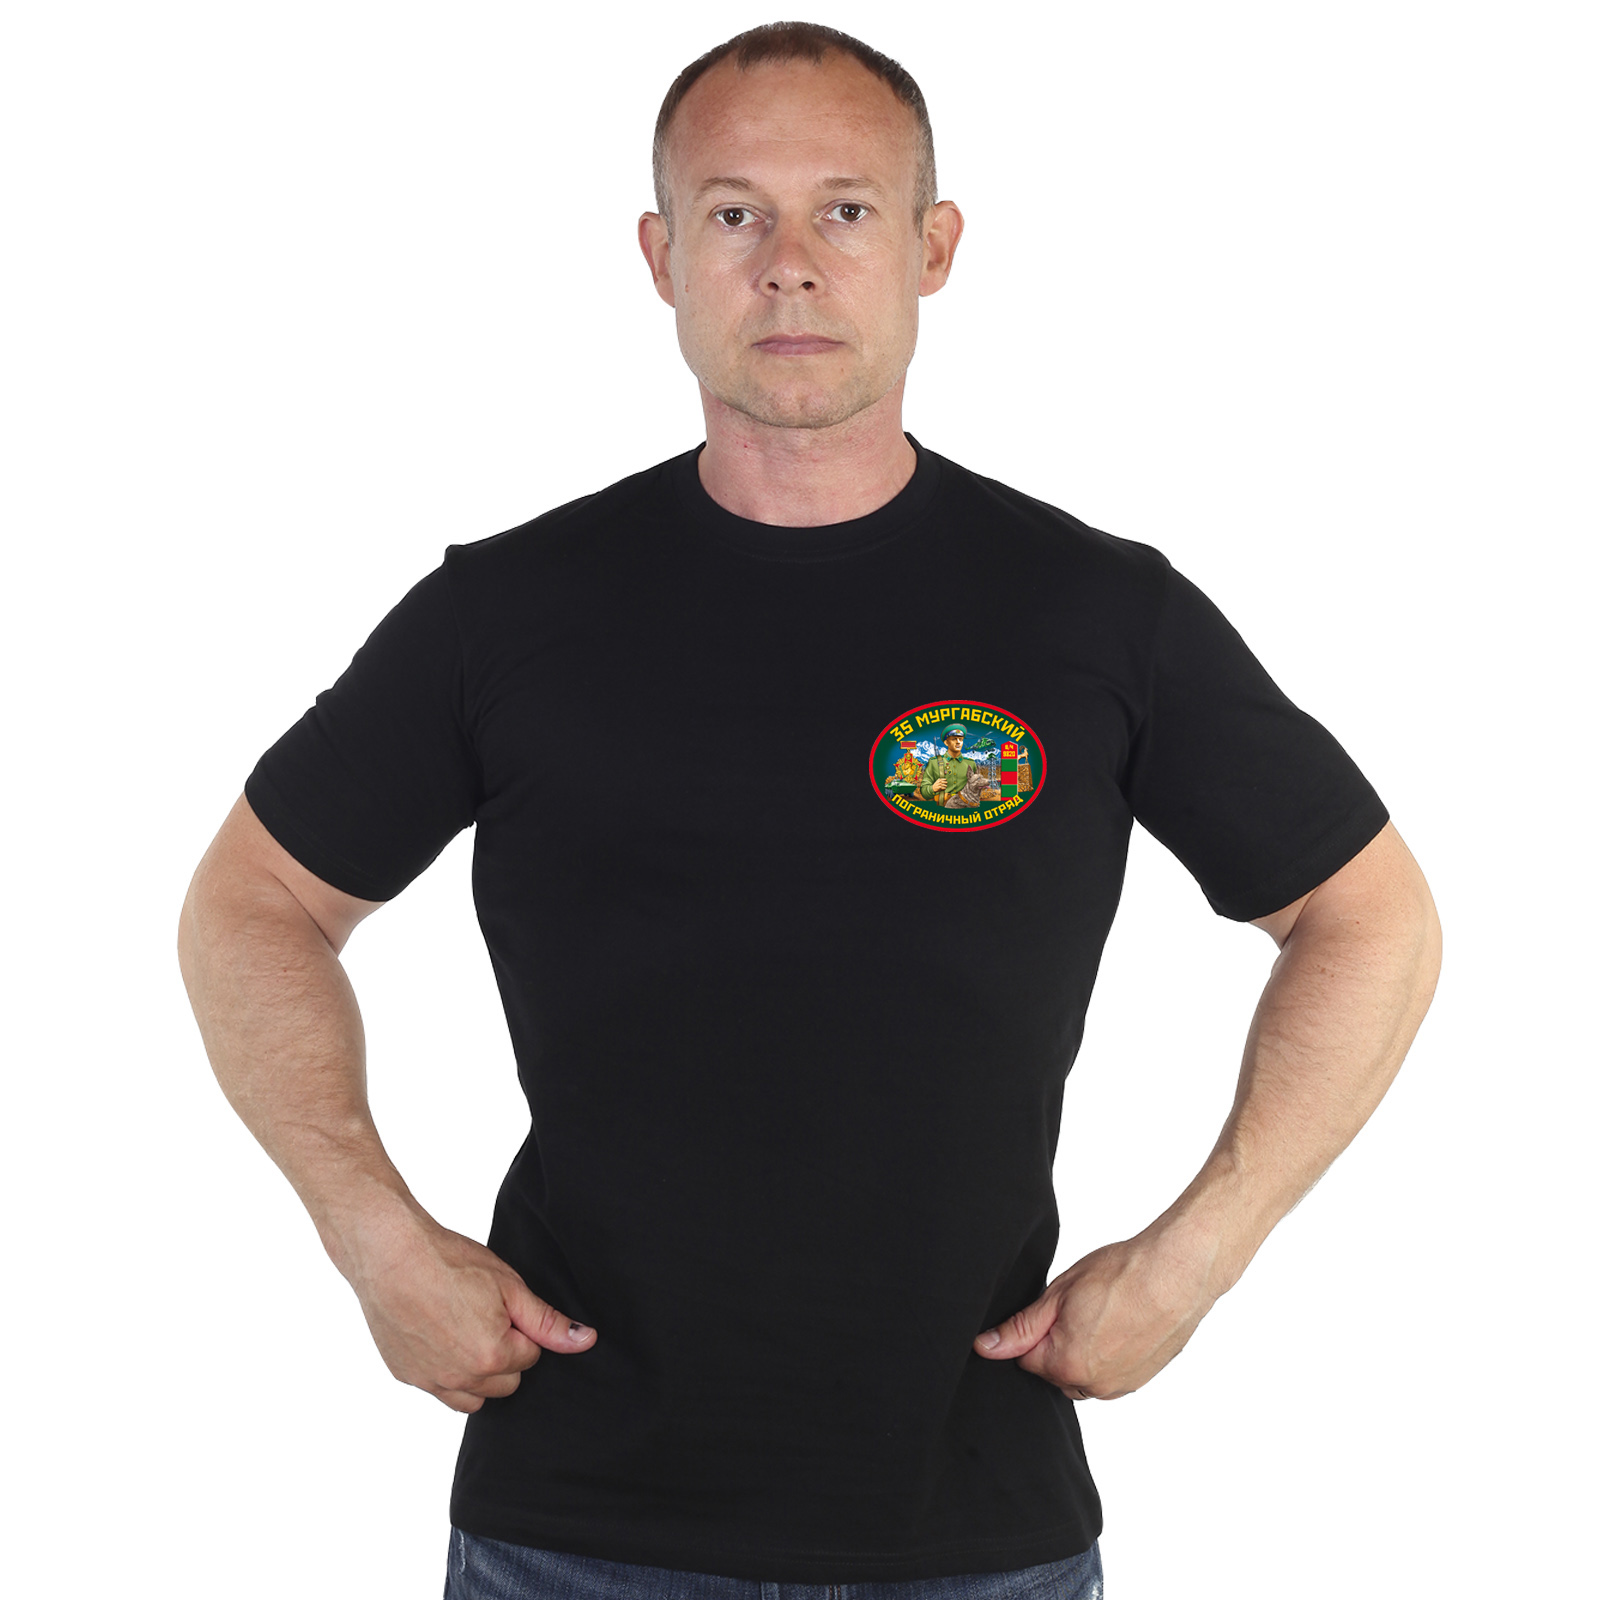 Заказать черную футболку 35 Мургабский погранотряд